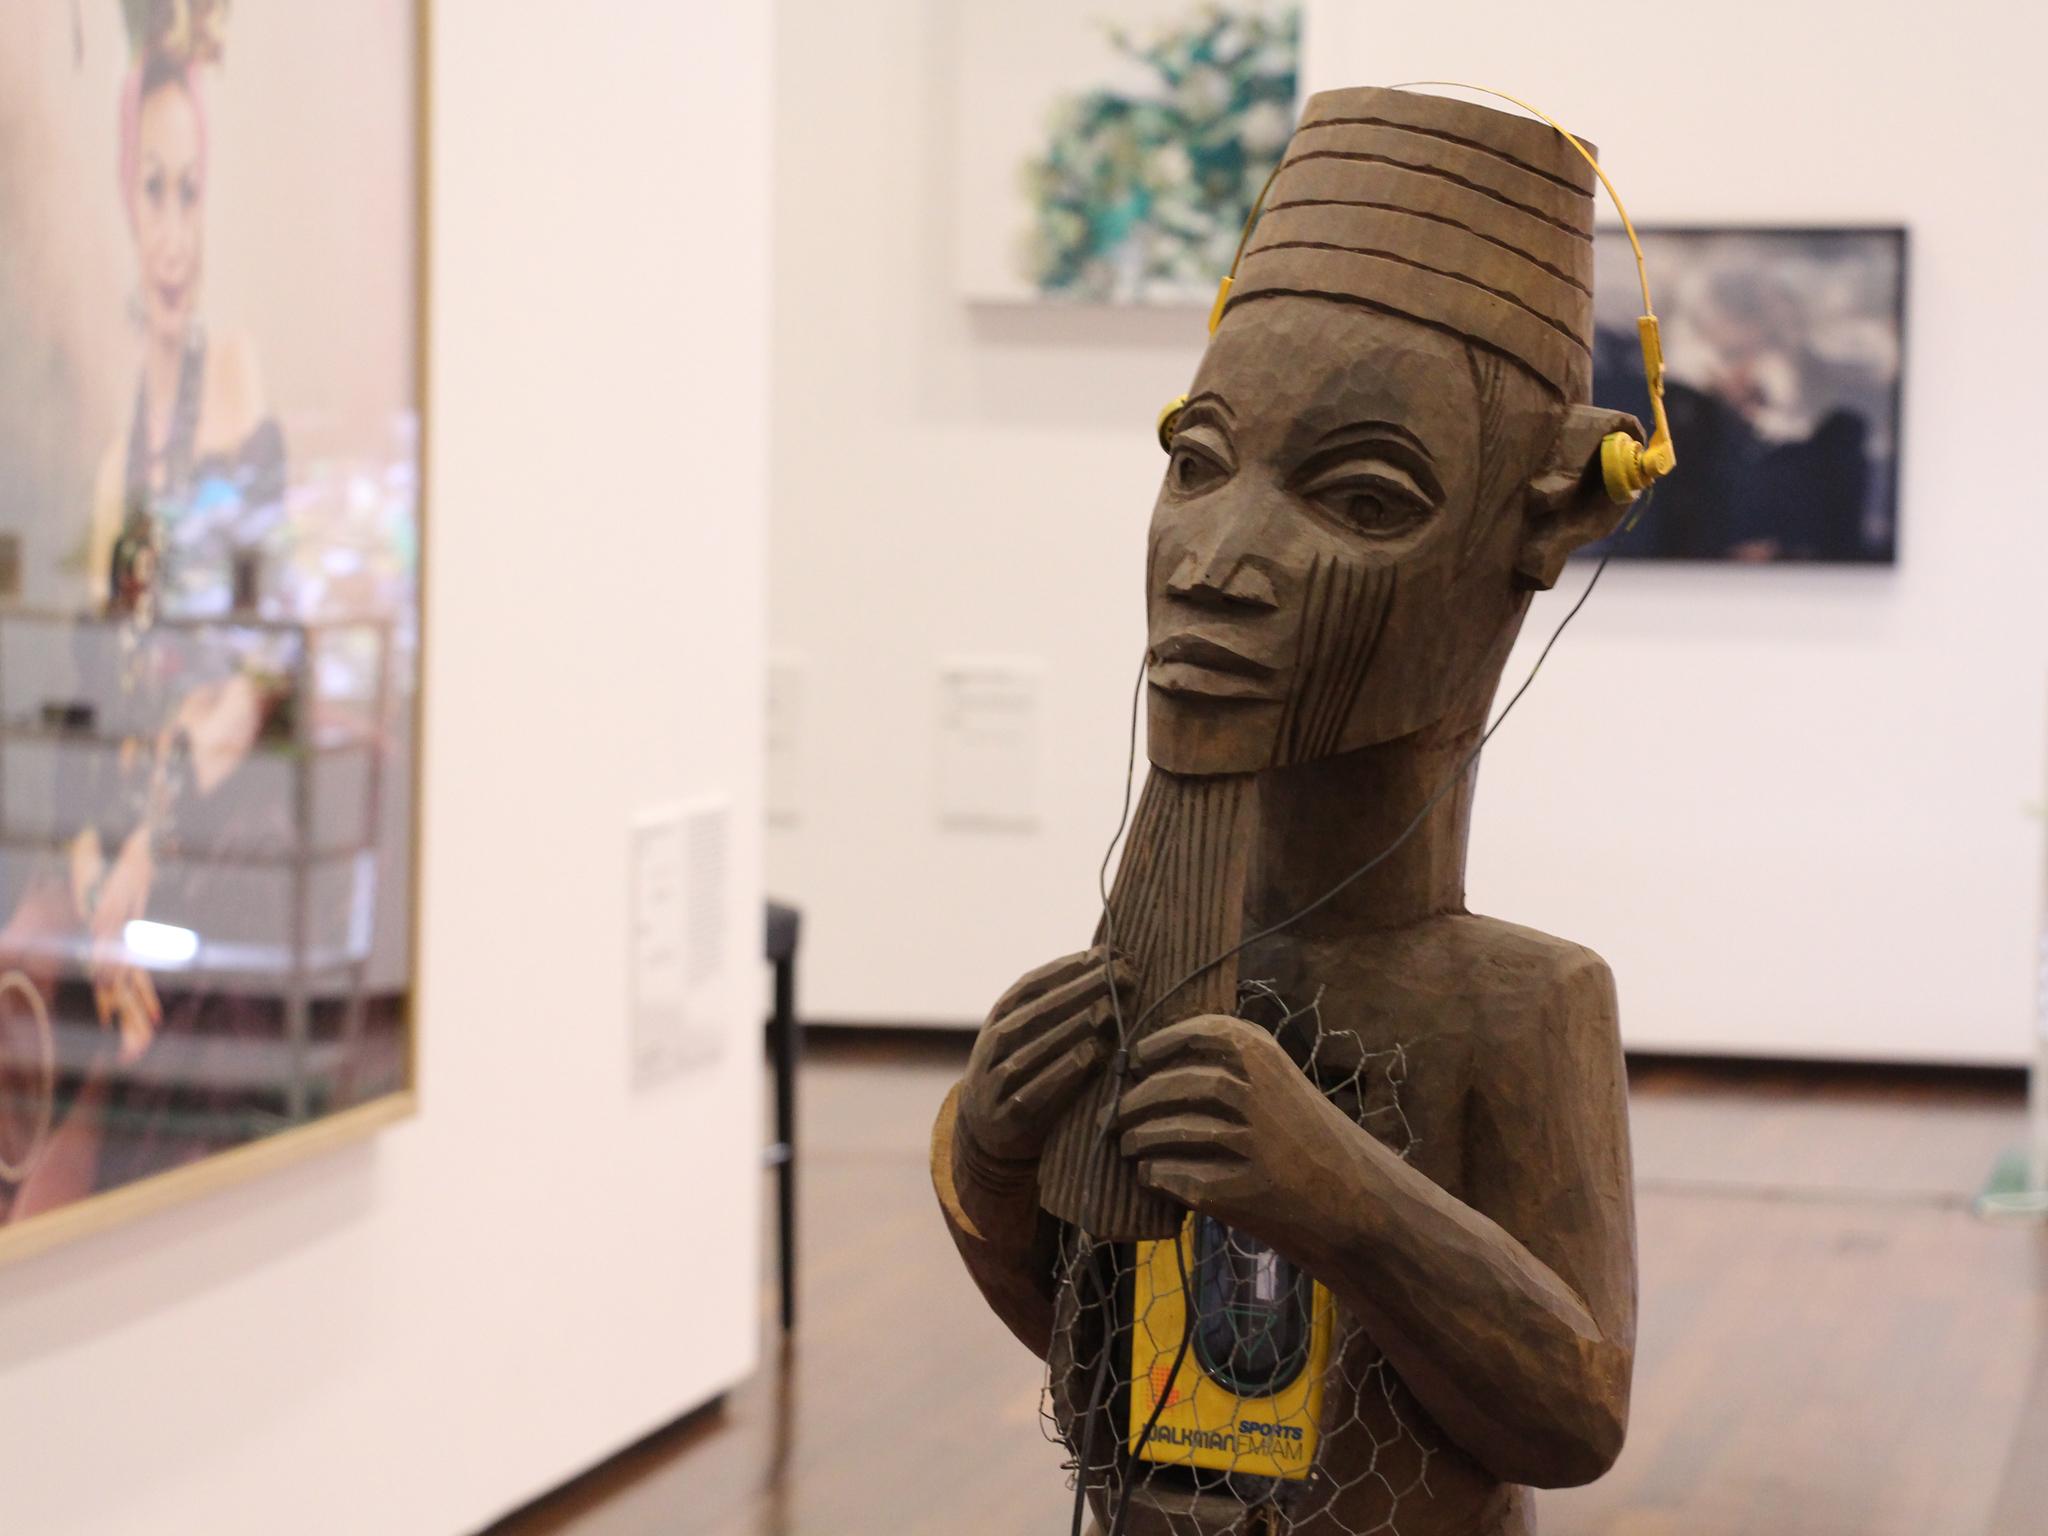 An exhibition at Mac Val arts centre in Vitry-sur-Seine